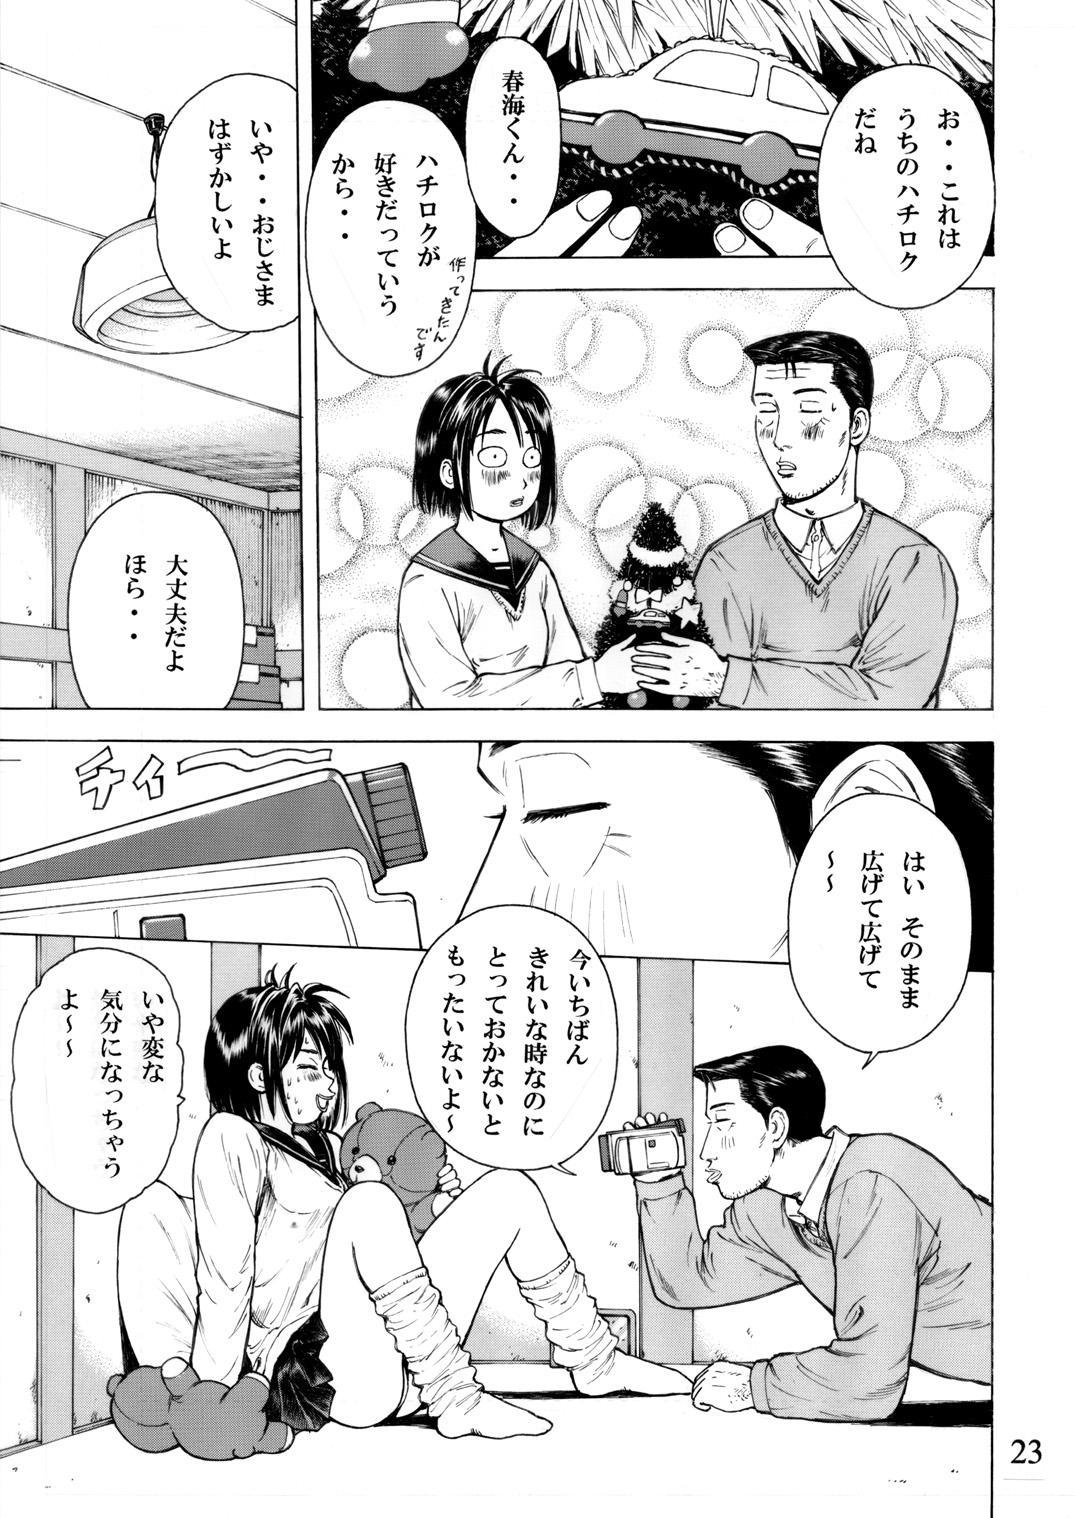 Mikuru de Milk de Milk de Mikuru 21